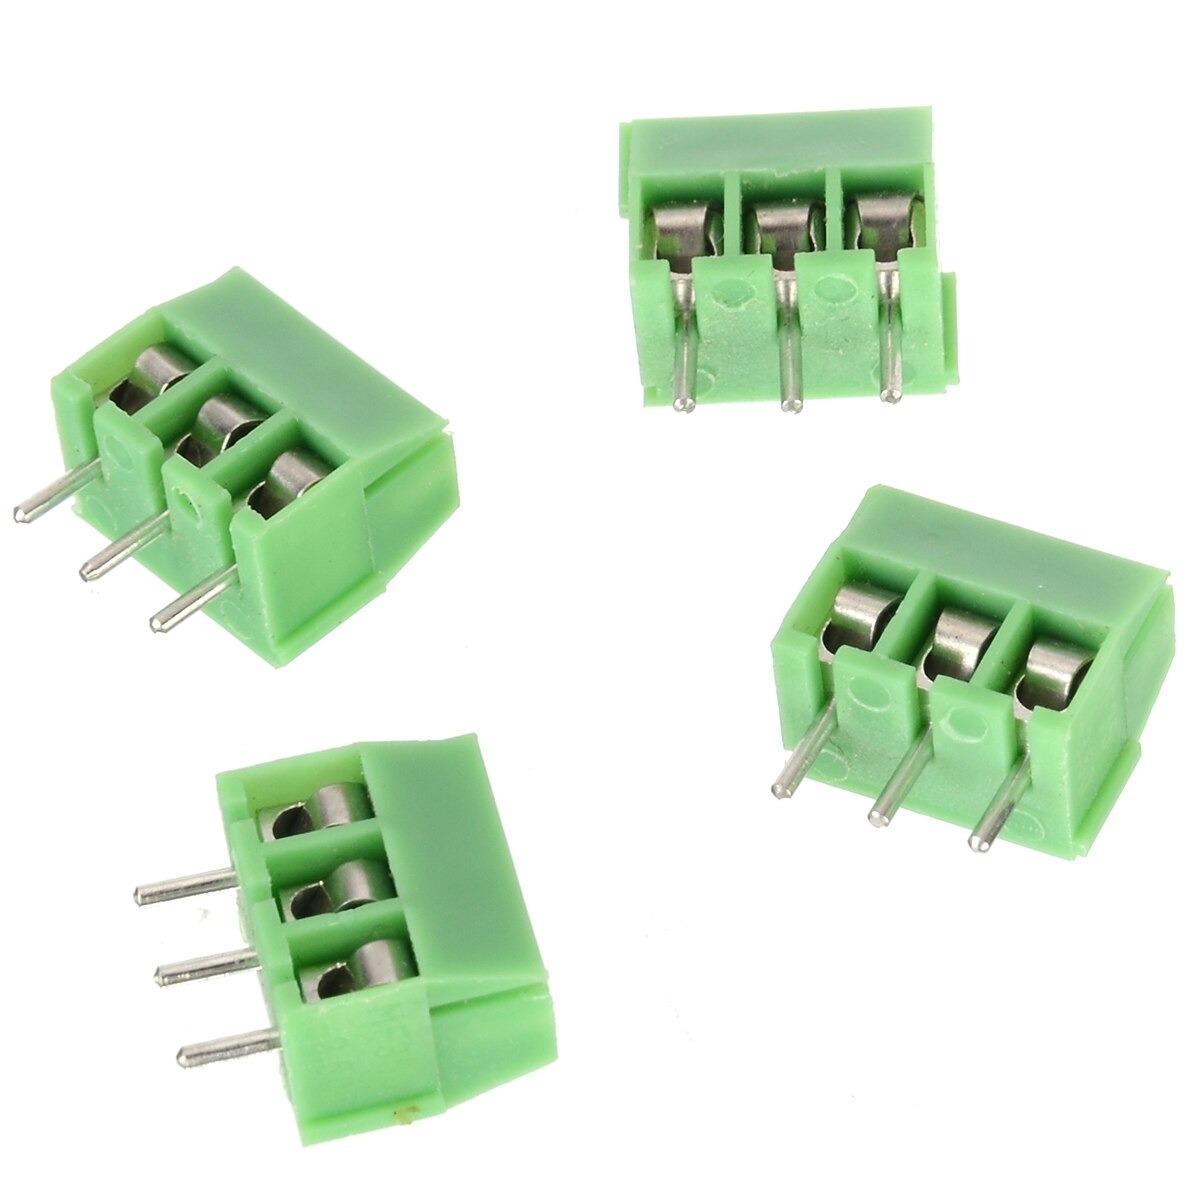 1Set MEGA-2560 Prototype Screw Terminal Block Shield Board Female Header Sockets Kit Electronic Components Supplies